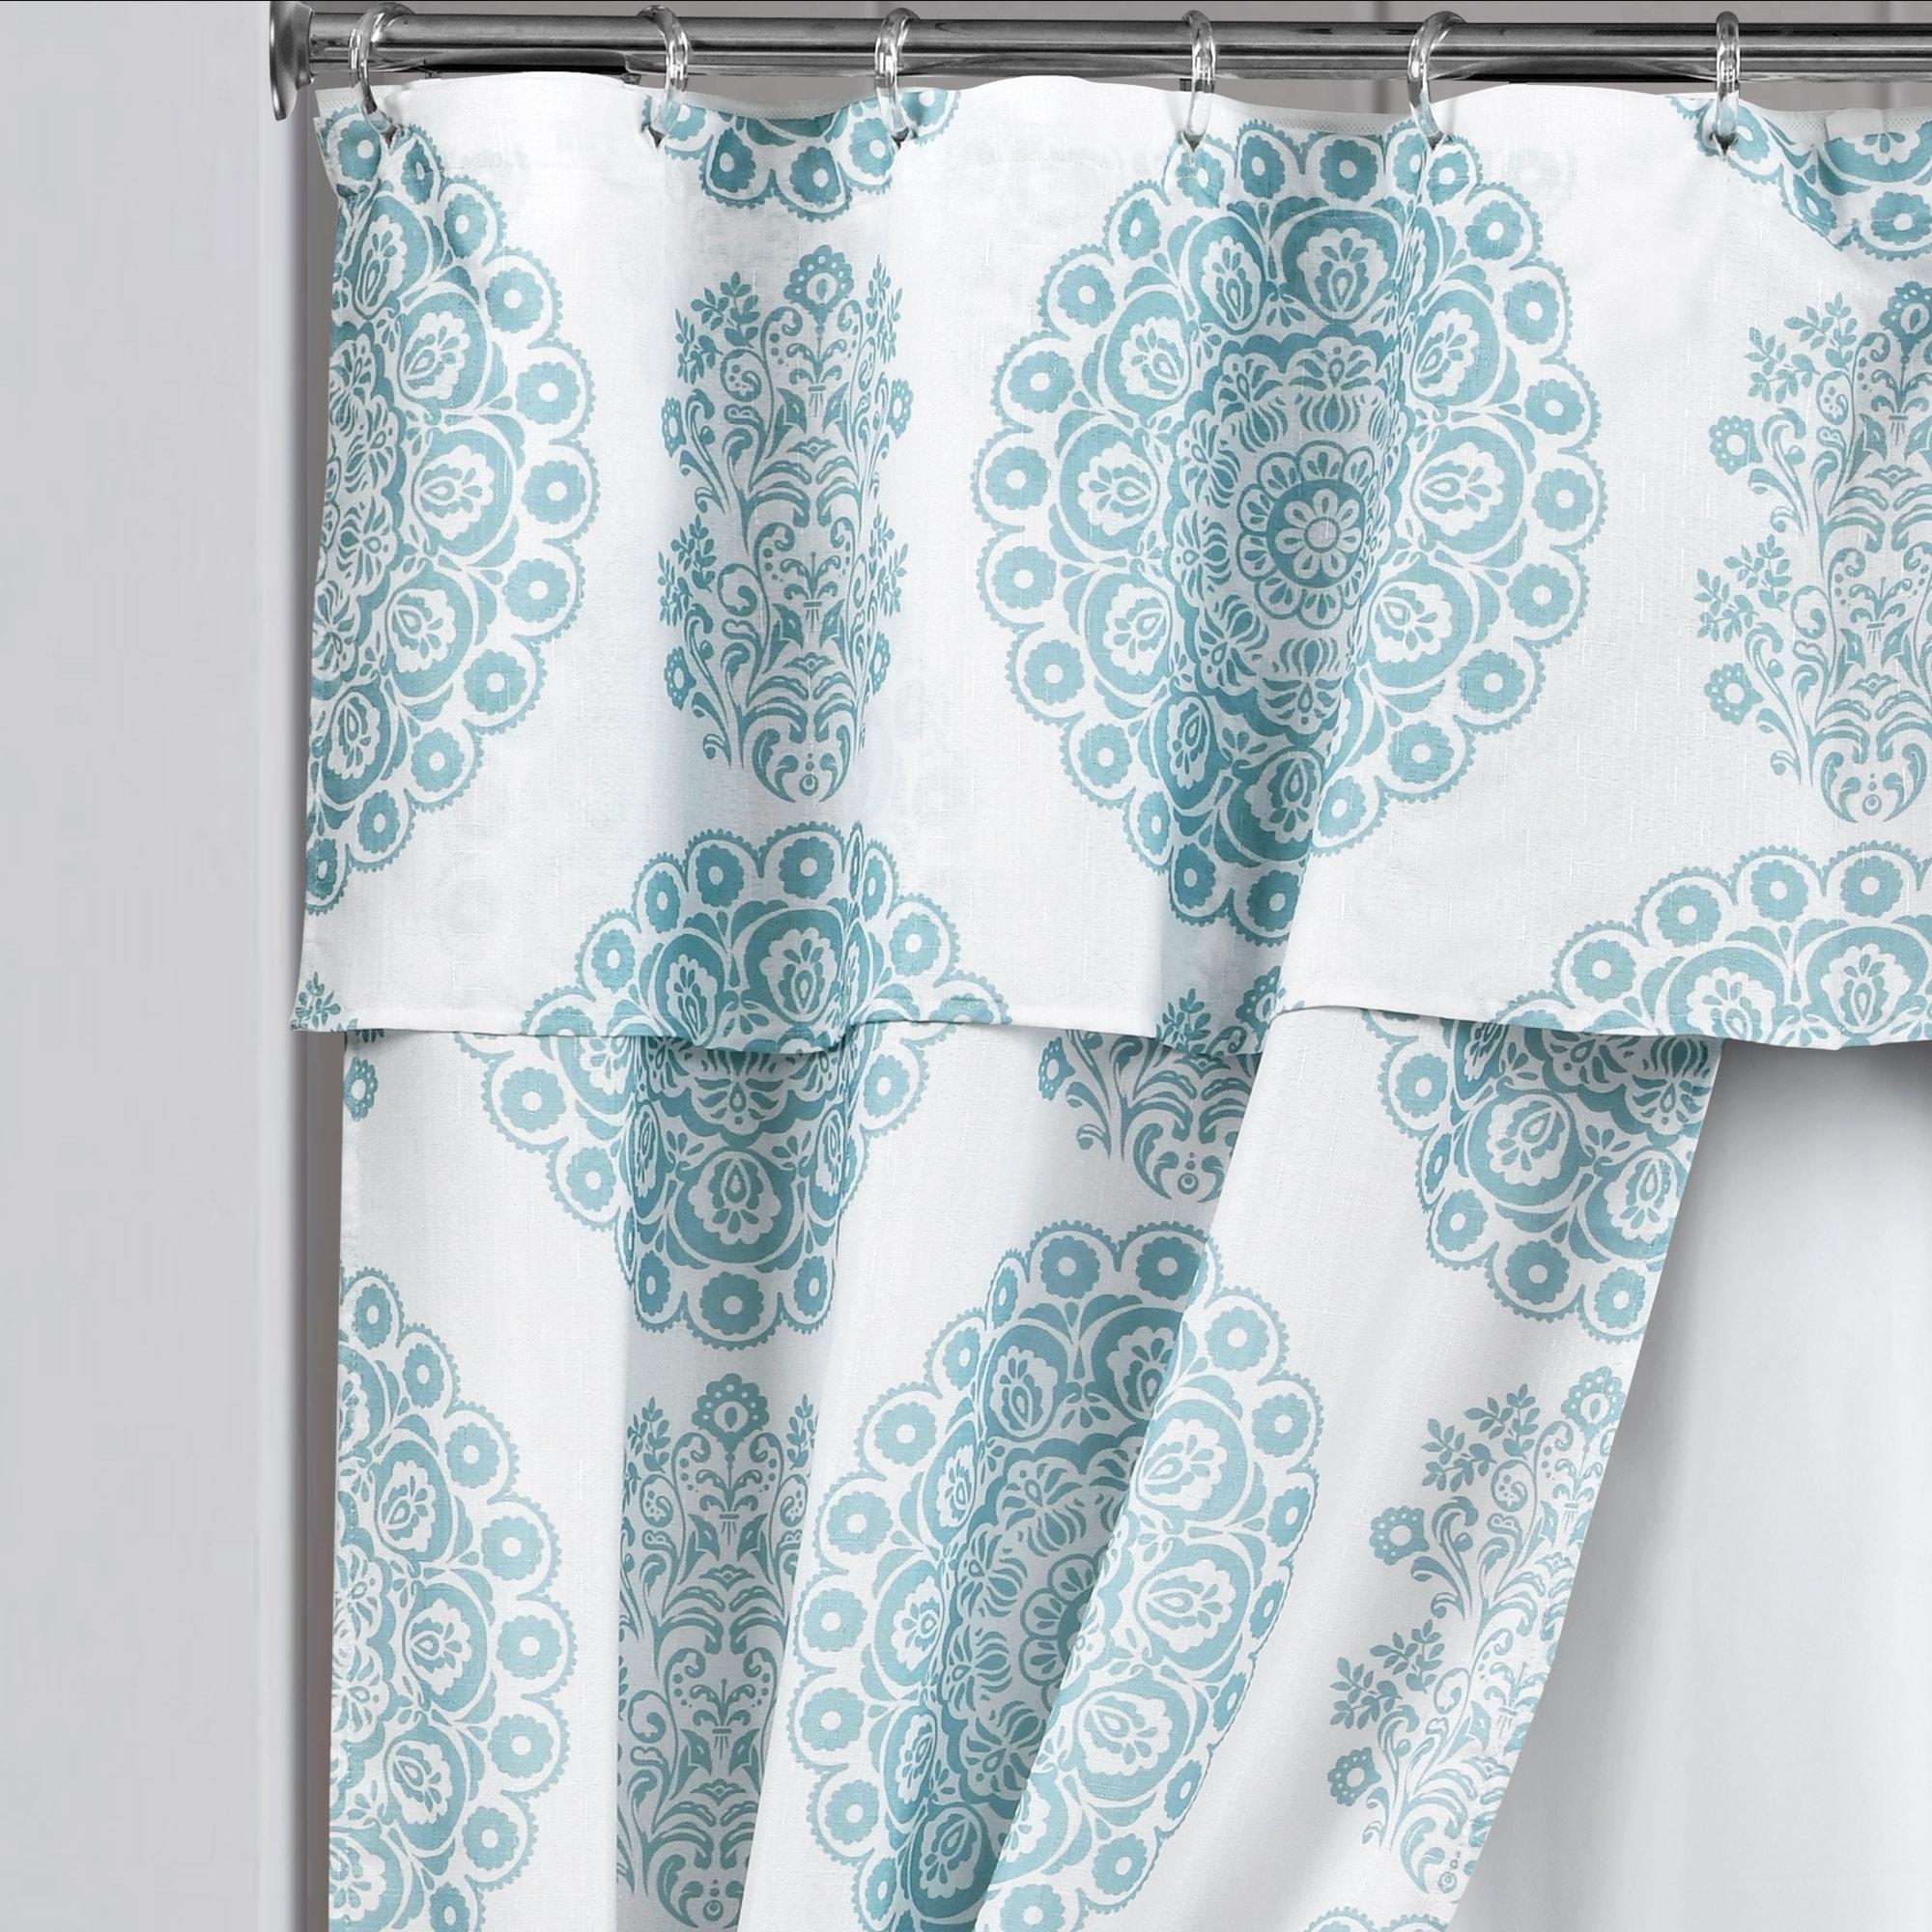 Lush Decor Evelyn Medallion 16 Piece Double Swag Shower Curtain Set